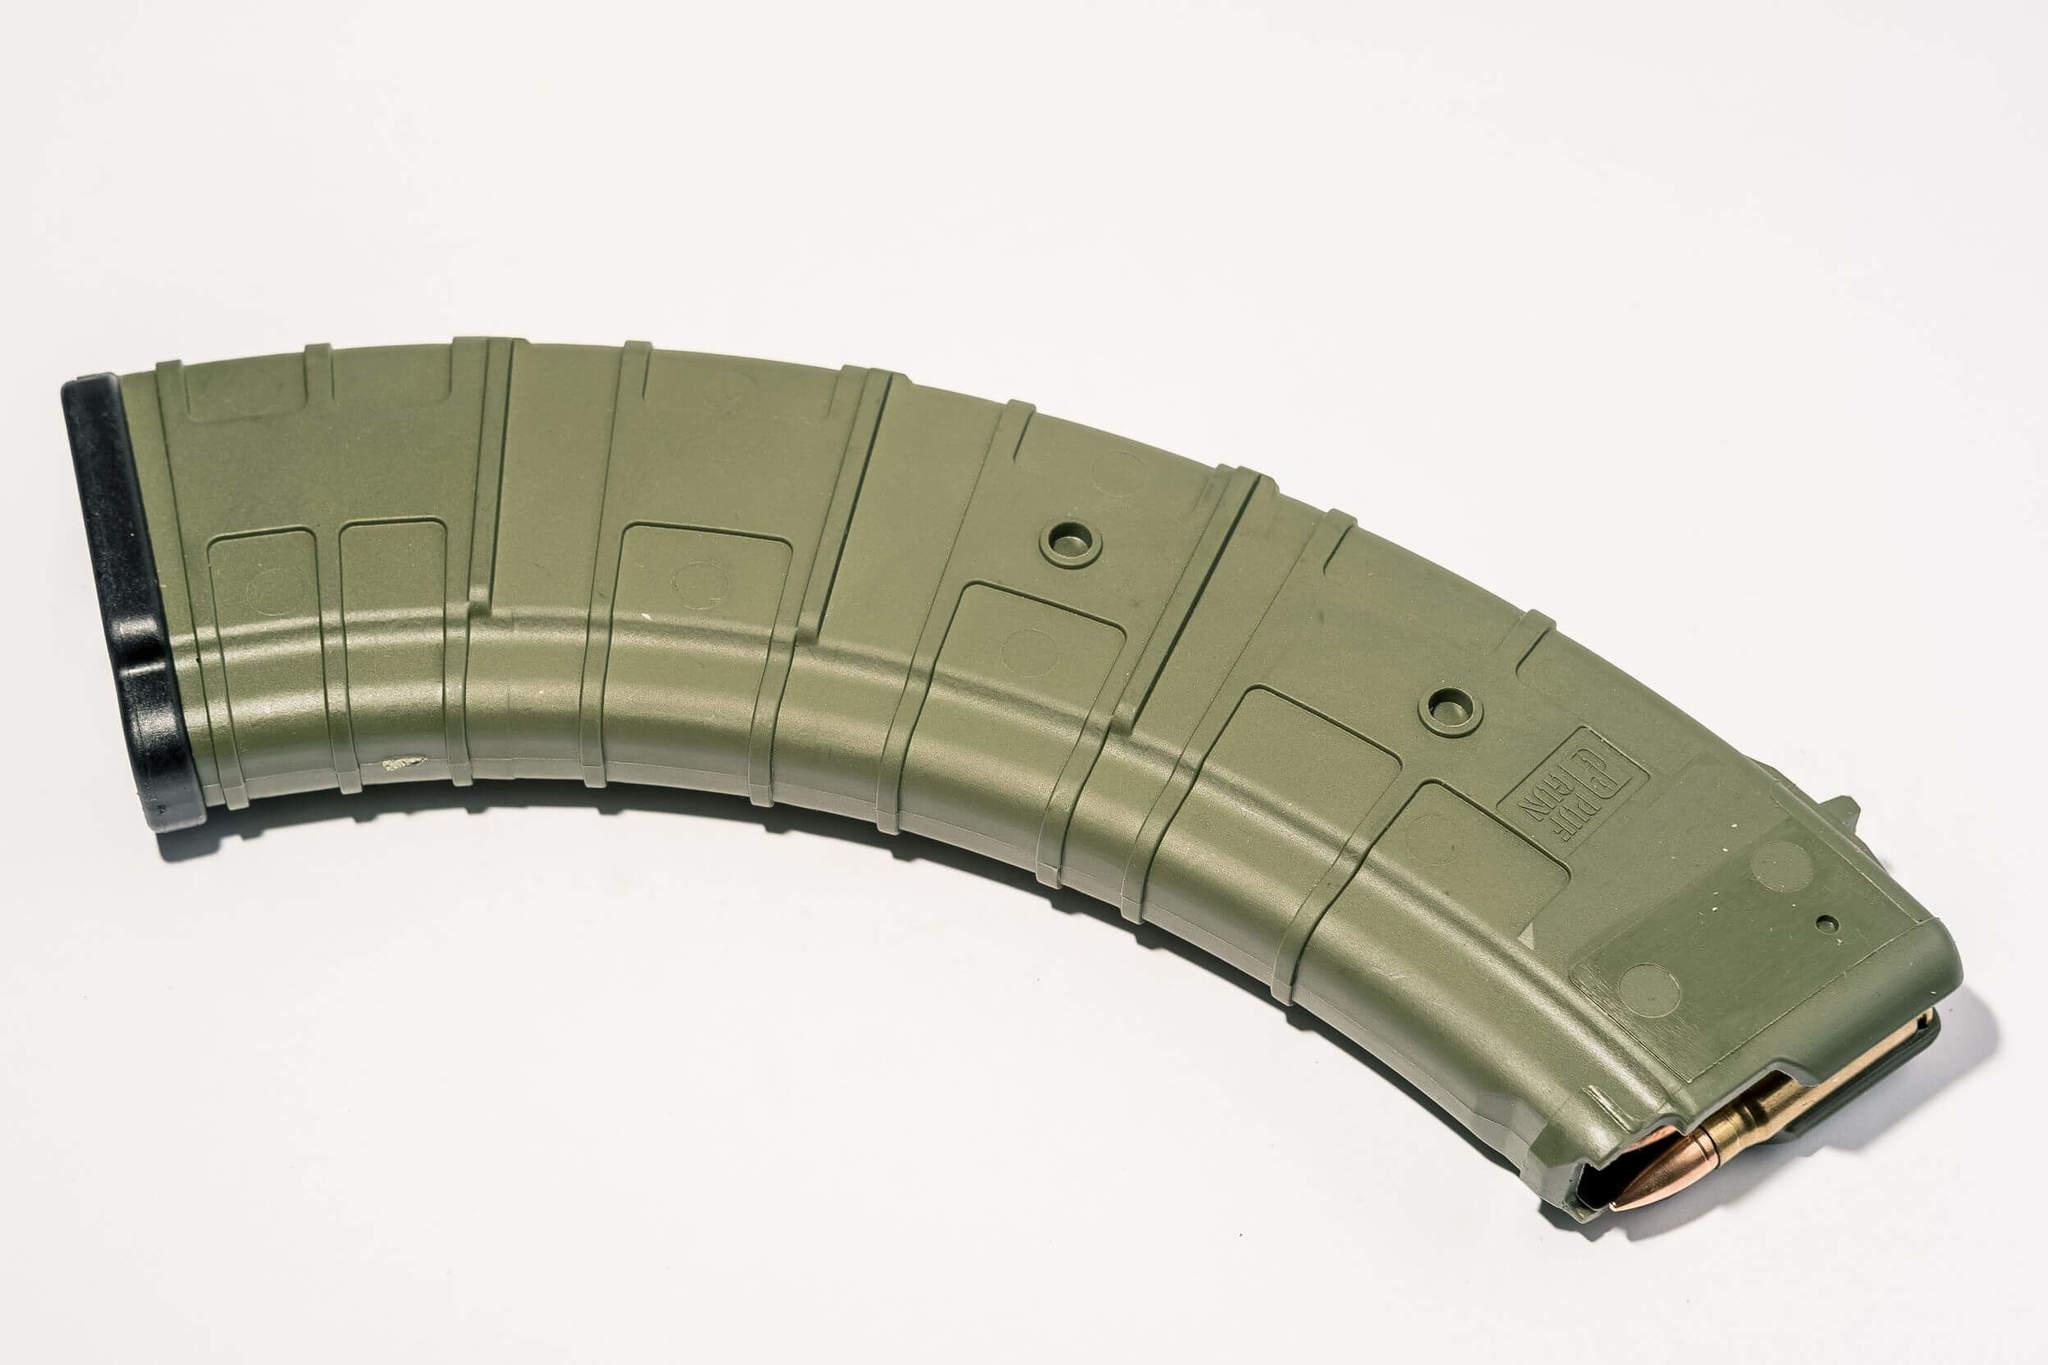 Магазин Pufgun для АКМ 7.62x39 ВПО-136 ВПО-209 на 40 патронов, цвет олива